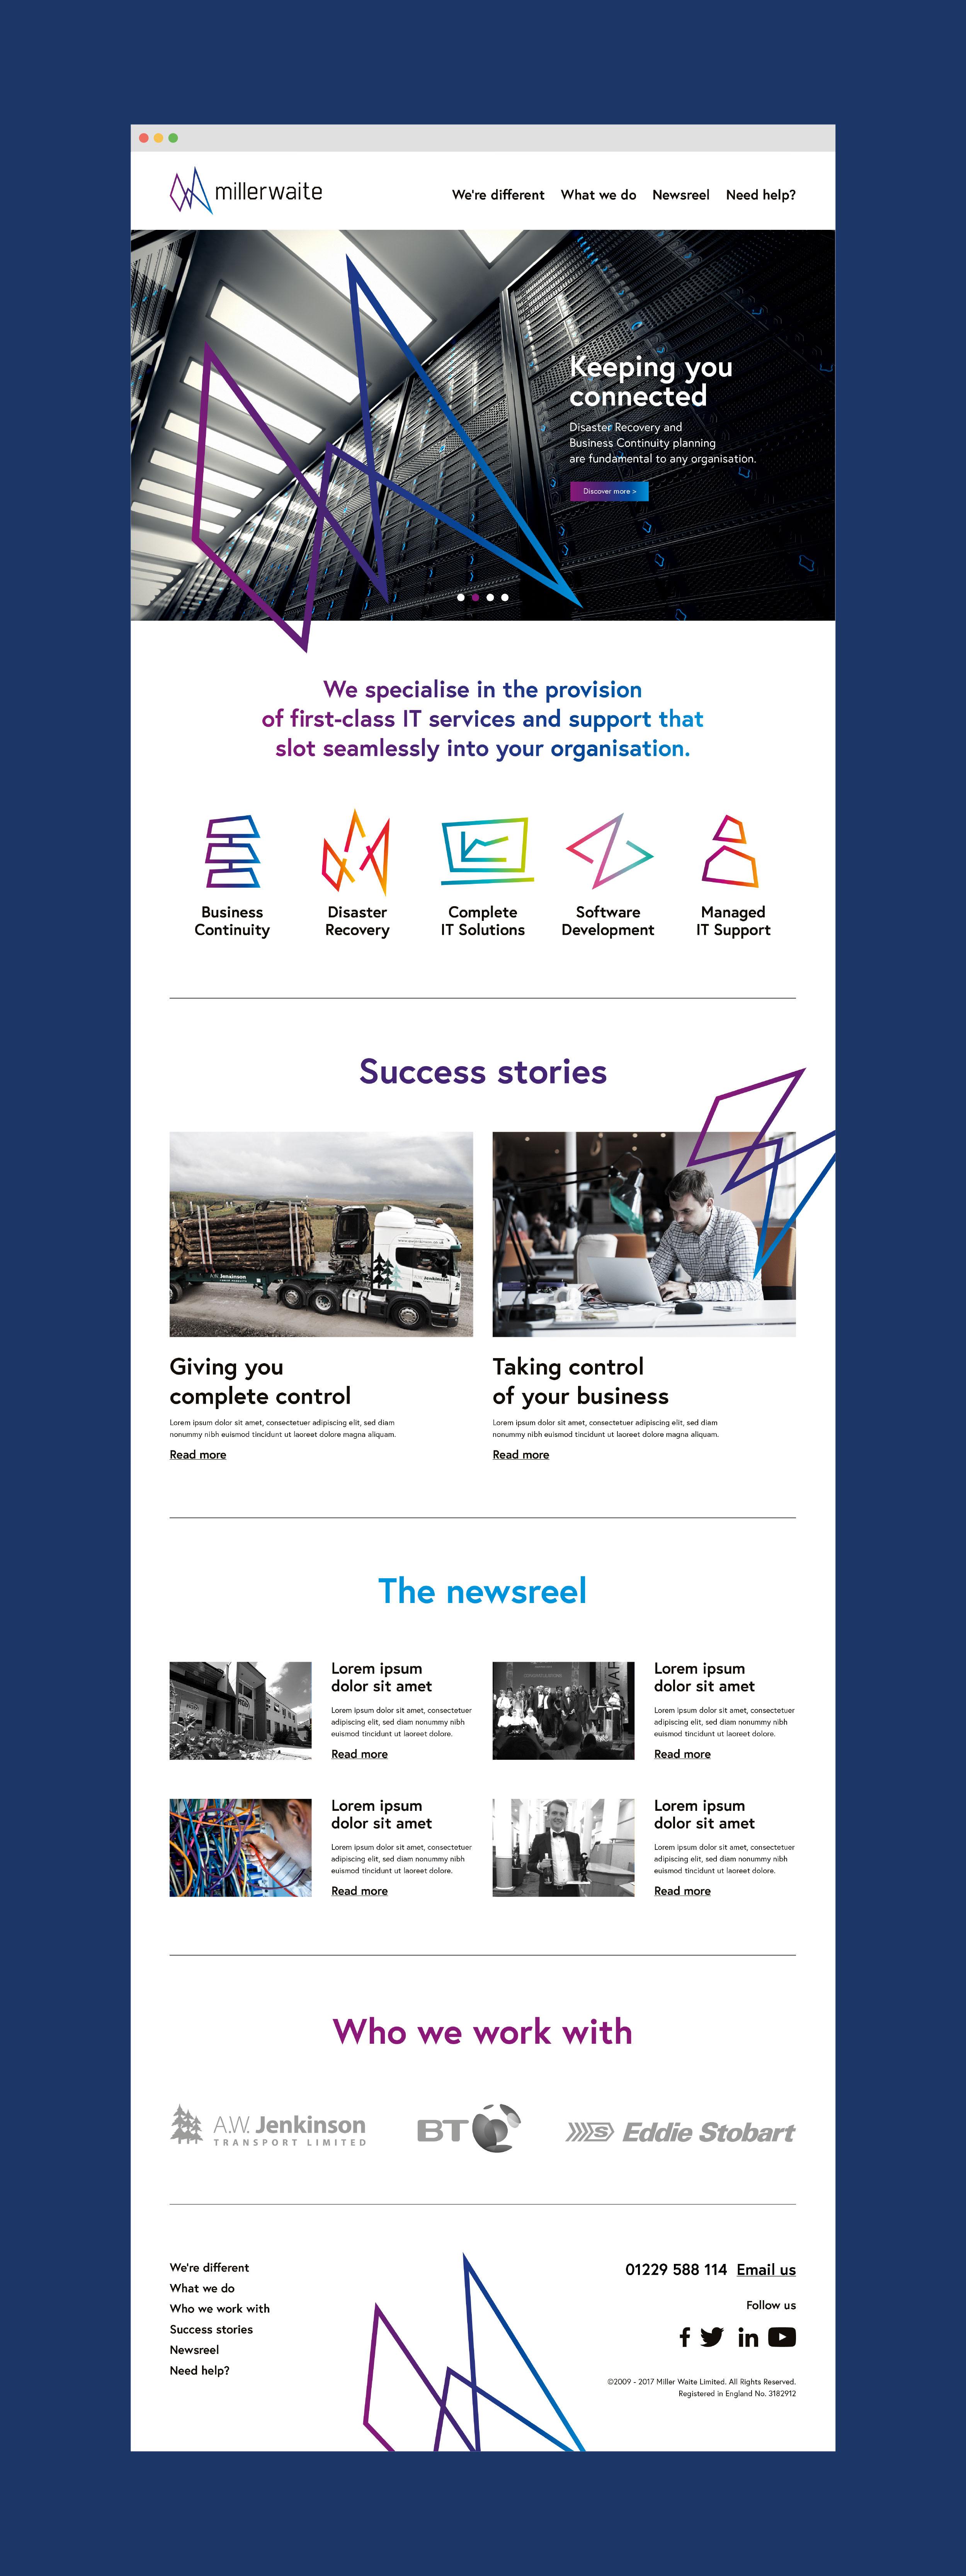 Miller Waite - Brand, Web Design, Print & Stationery In Shrewsbury